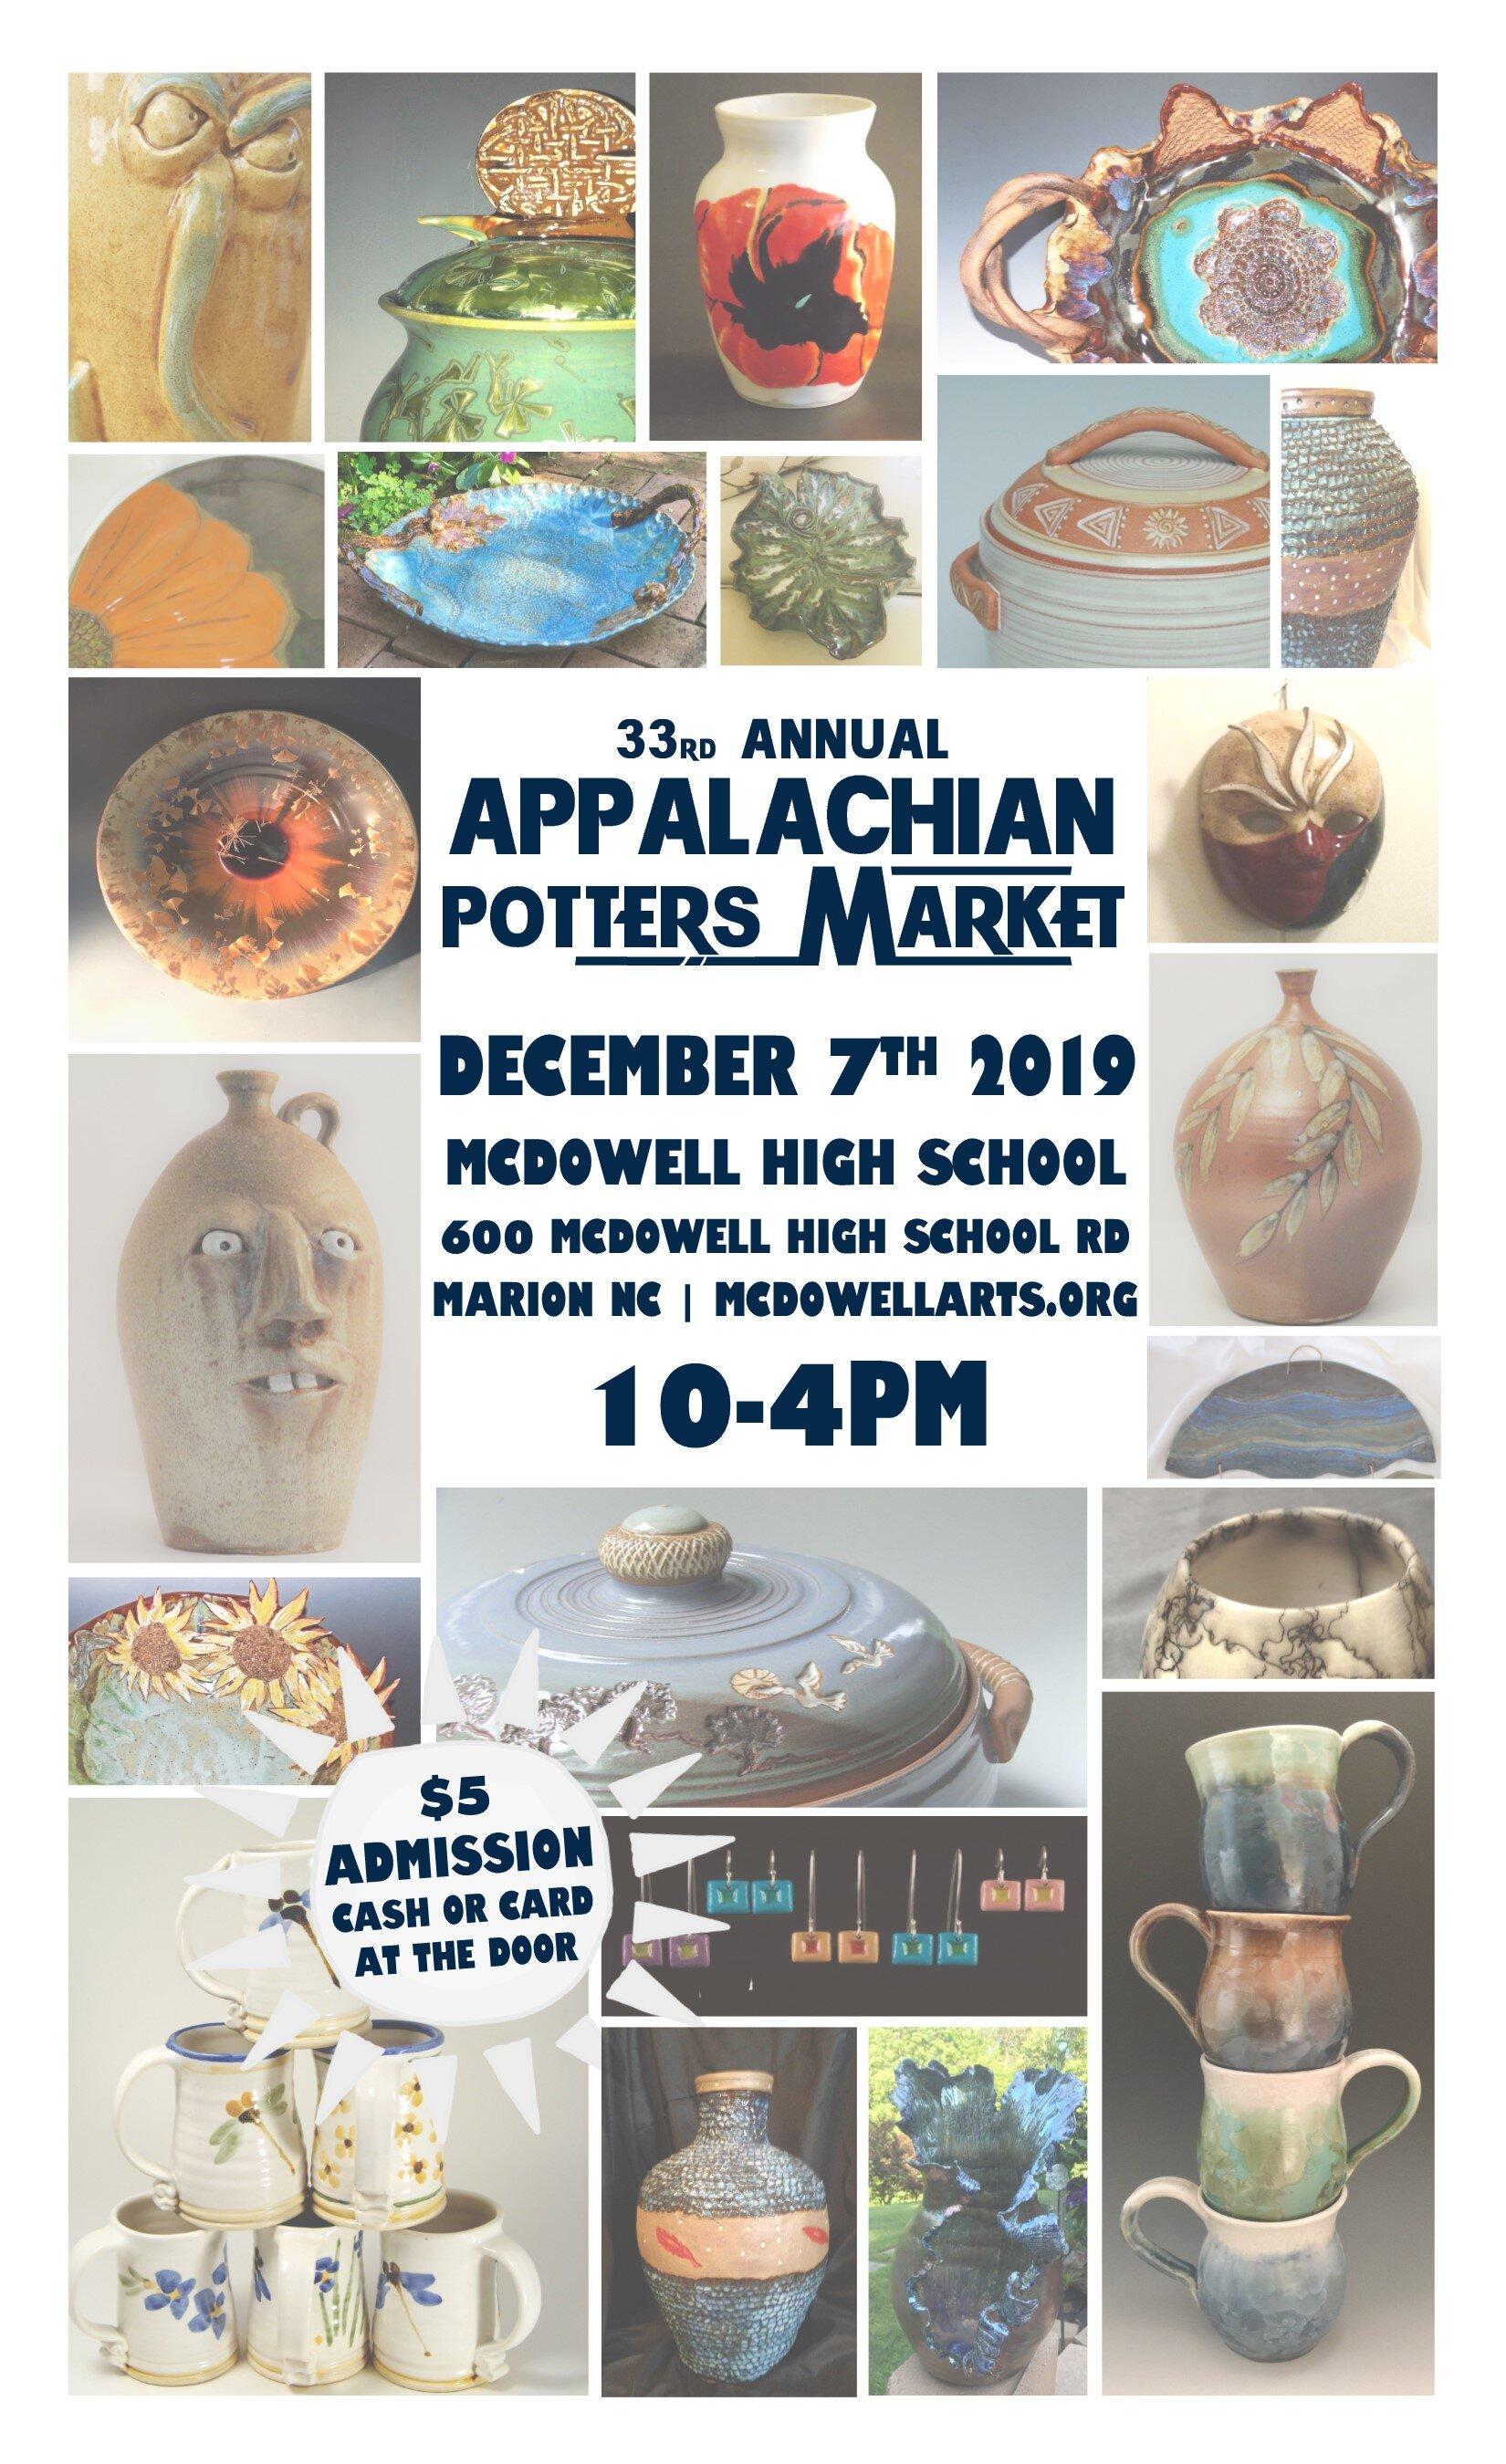 Appalachian Potters Market - Appalachian Potters MarketDecember 7th, 201910am - 4pmMcDowell High School600 McDowell High DrMarion, North Carolina 28752More info: www.facebook.com/events/2521909681365661